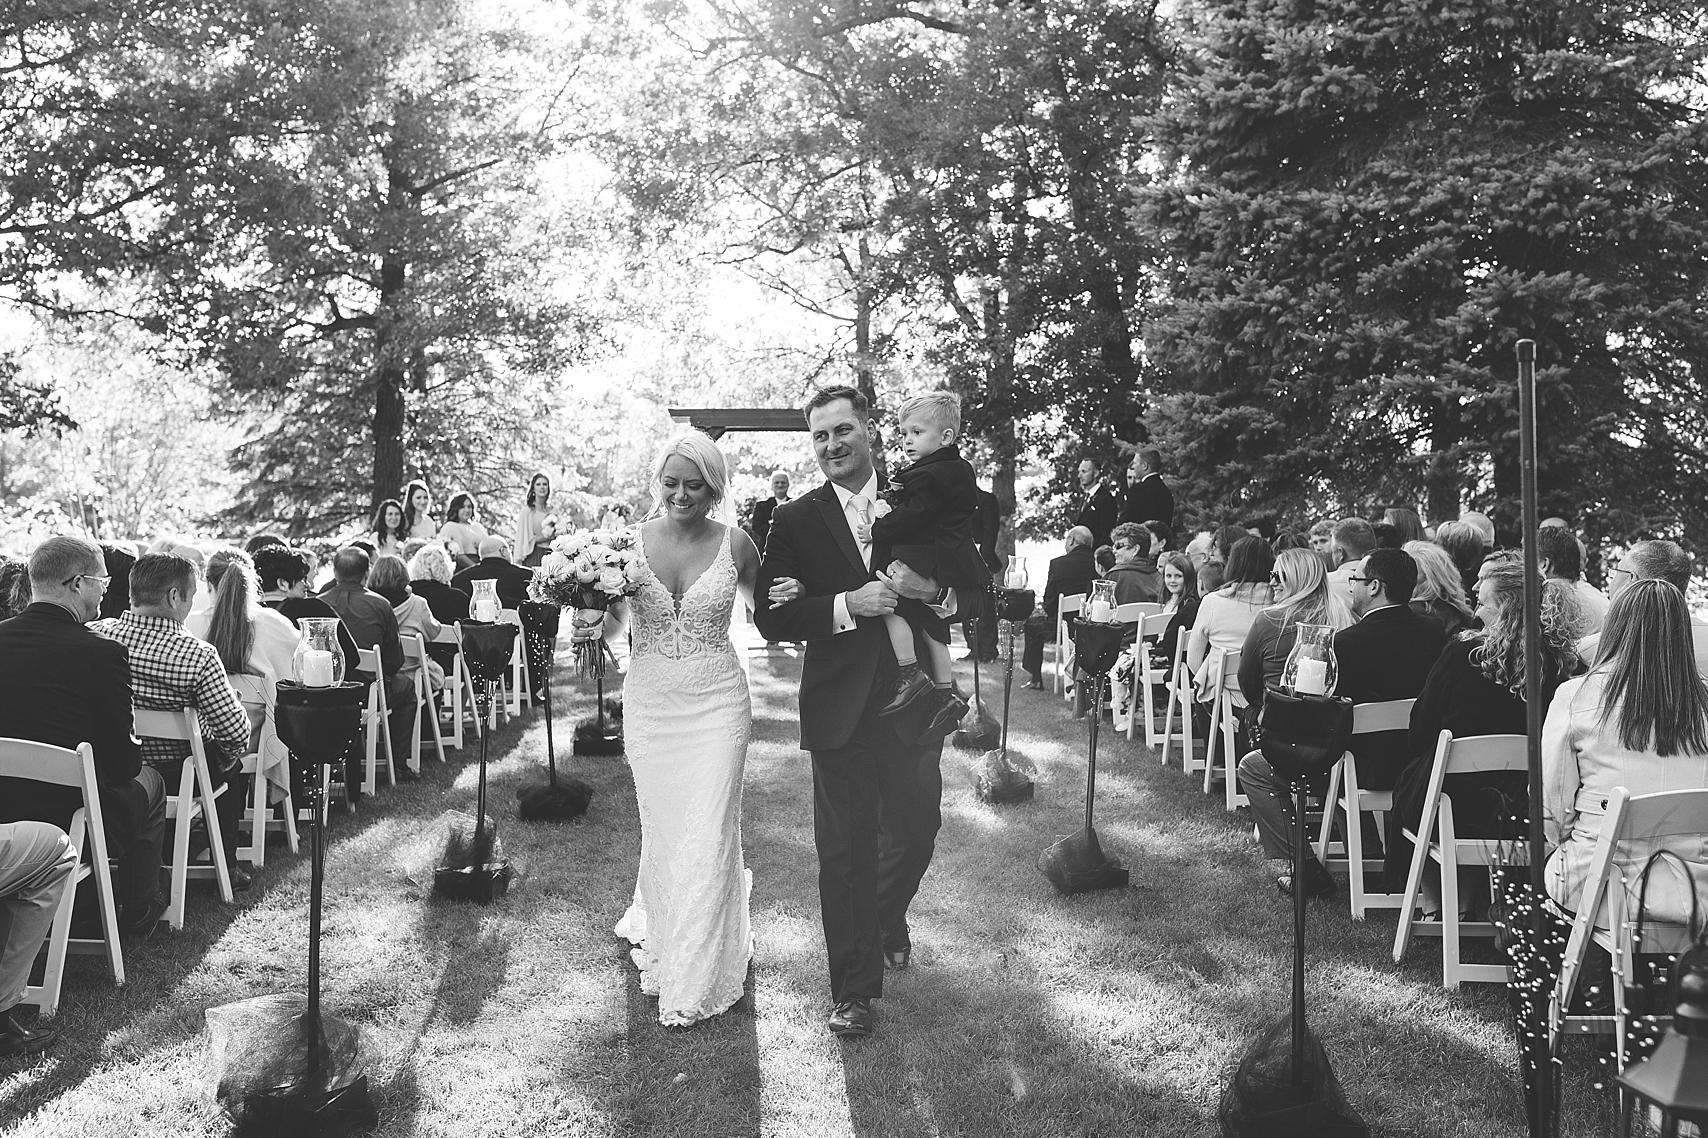 Outdoor wedding ceremony celebratory exit at the Chart House Summer Wedding Lakeville Minnesota Minneapolis Wedding Photographer Mallory Kiesow